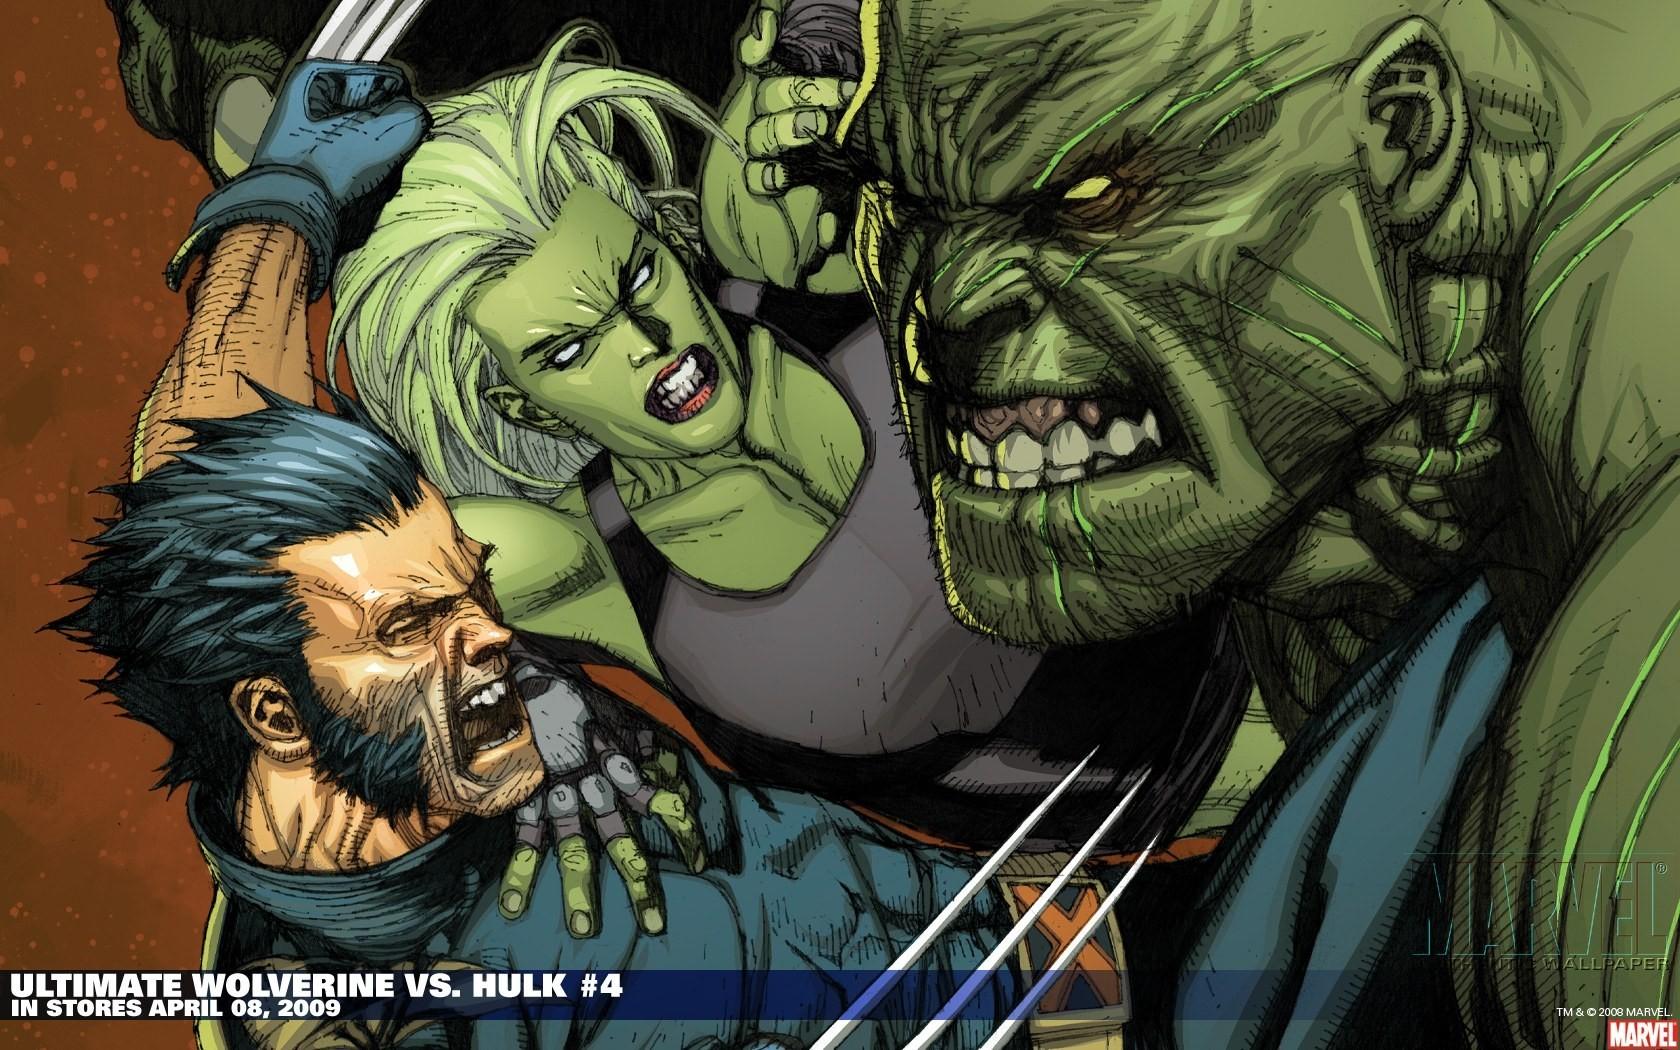 Hulk comic character comics wolverine she marvel wallpaper 1680x1050